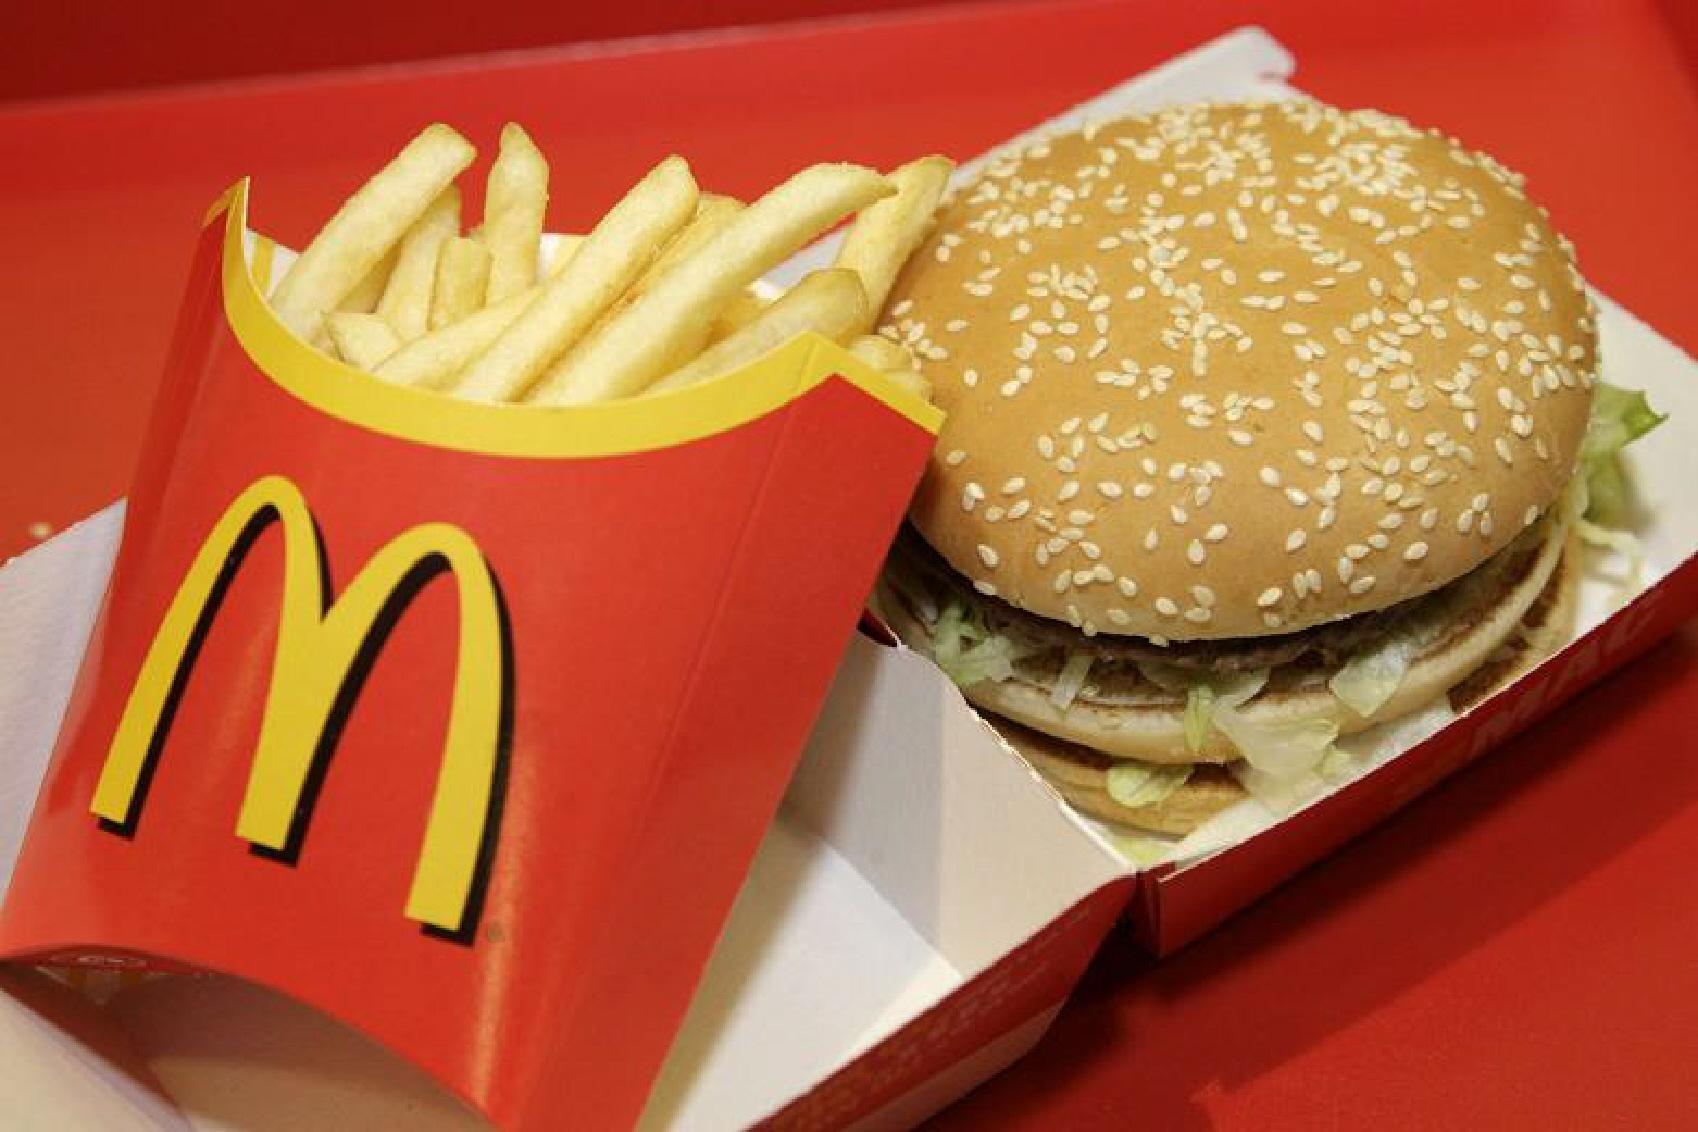 Monopoly WiiiiN! Promotion Rules McDonald's UK 20 snapfish digital photos mcdonalds